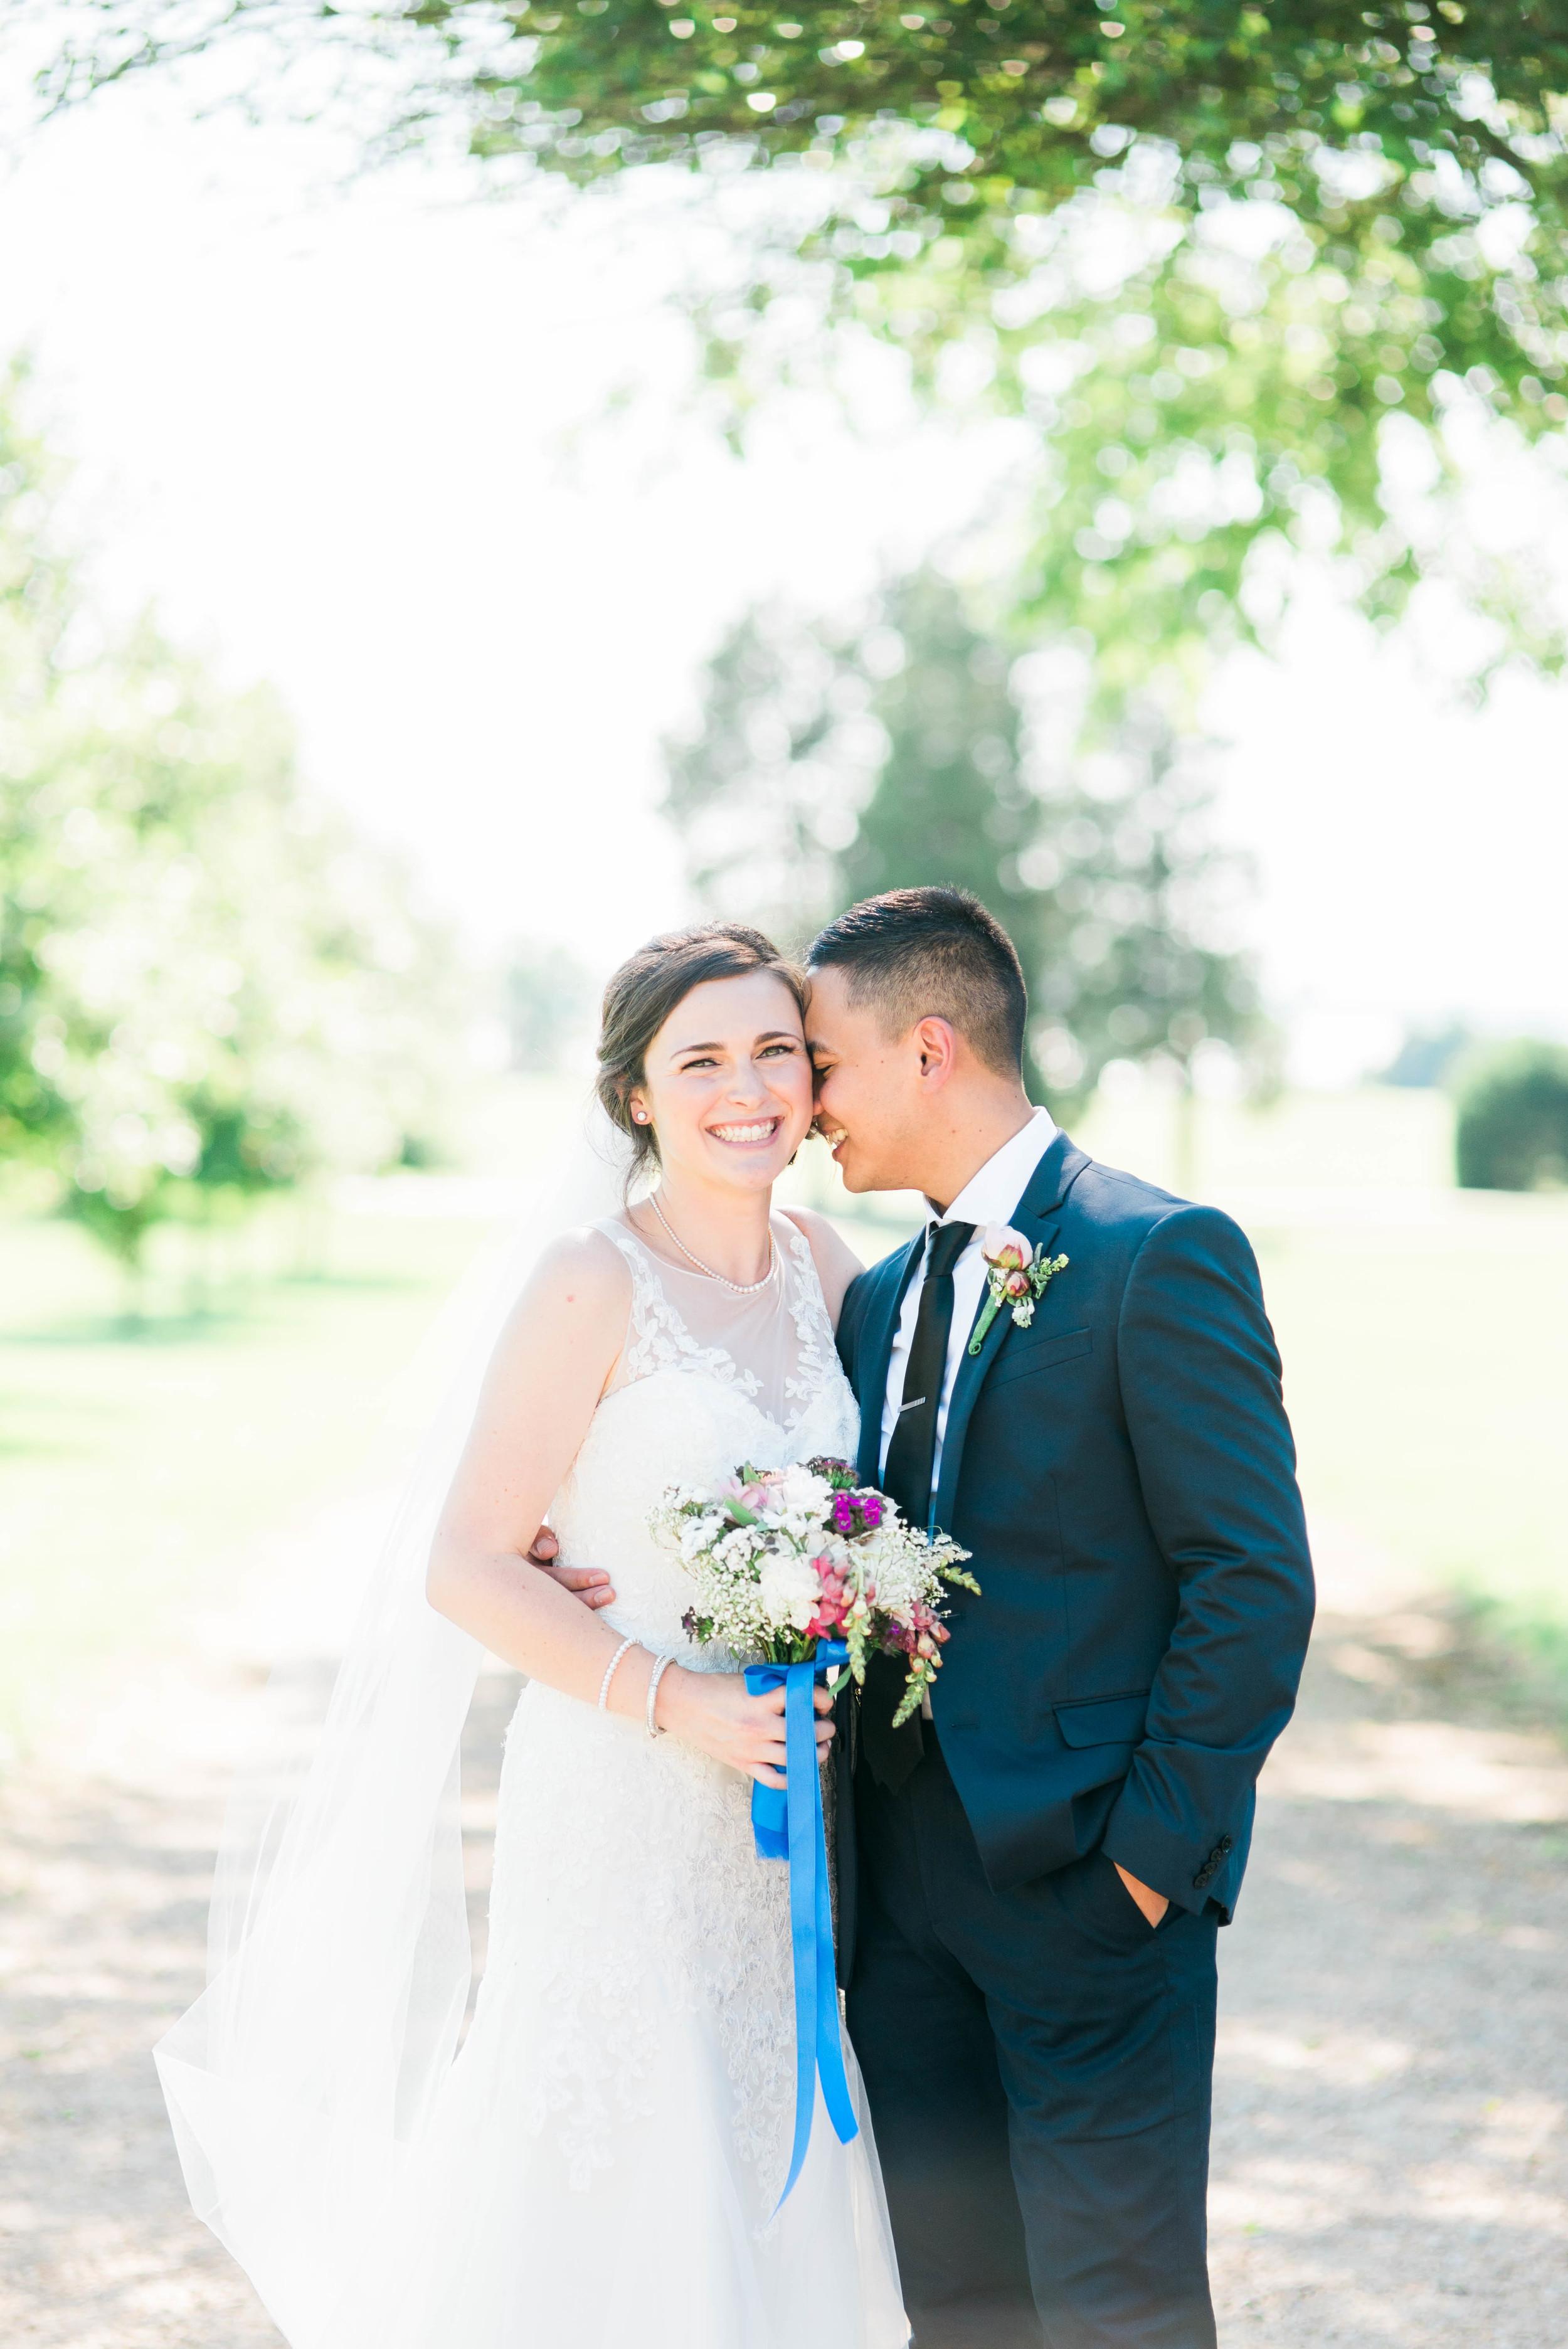 PREVIEWremowedding2016-42.jpg